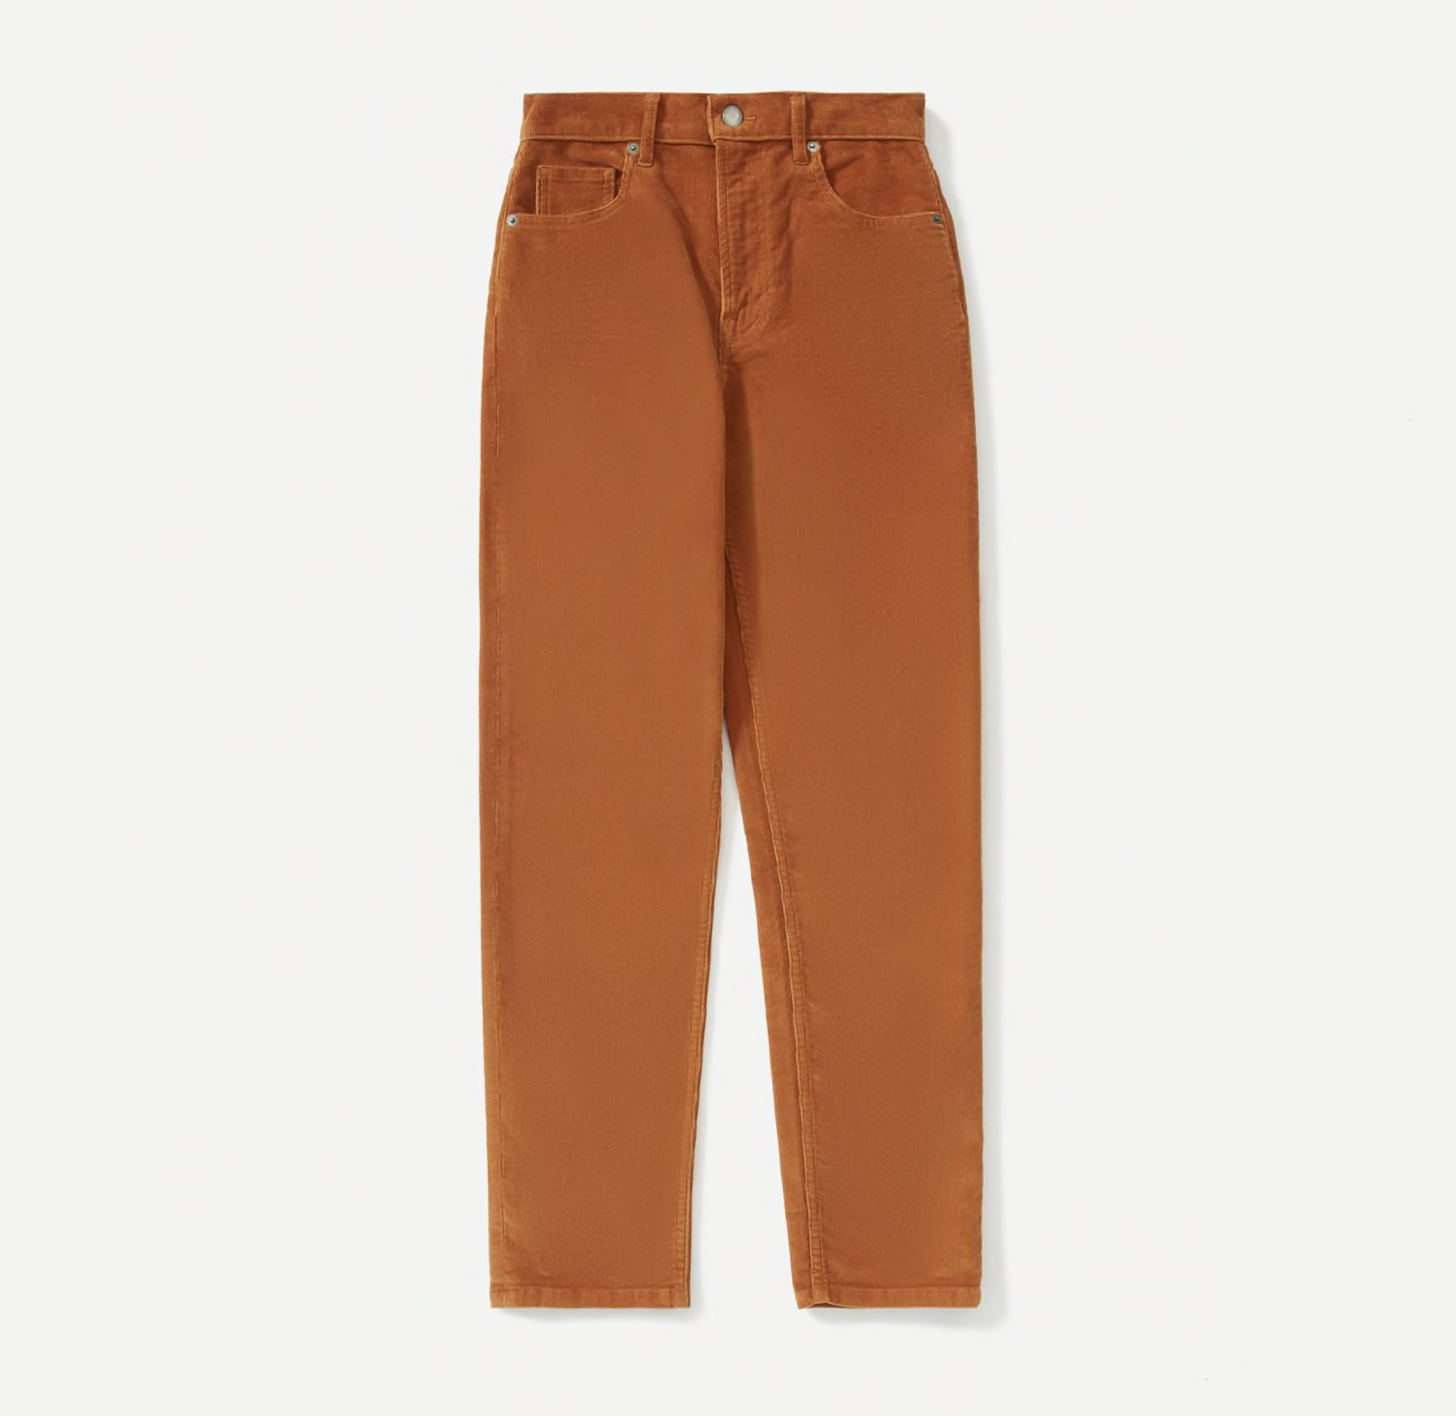 EVERLANE The Cheeky Straight Corduroy Pant — A$102